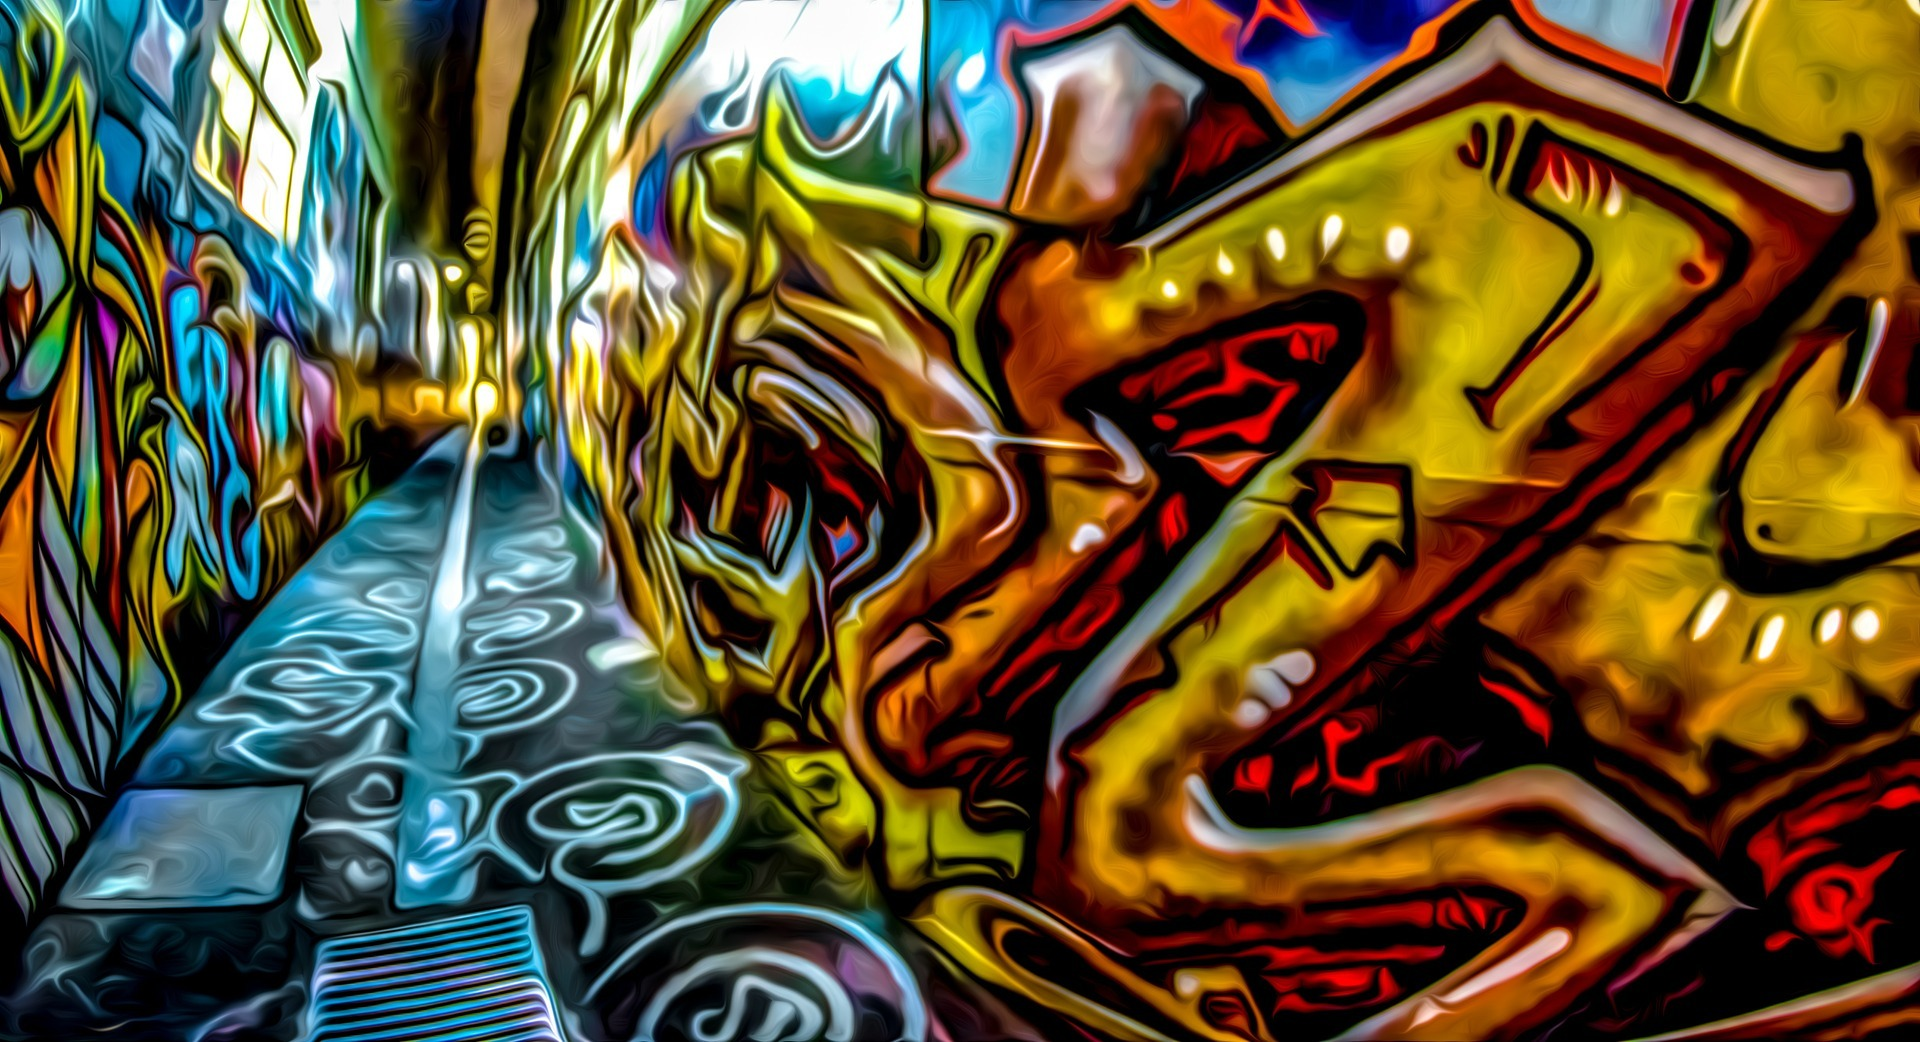 Street Wall Painting Wallpapers - Imagenes De Graffitis 4k - HD Wallpaper